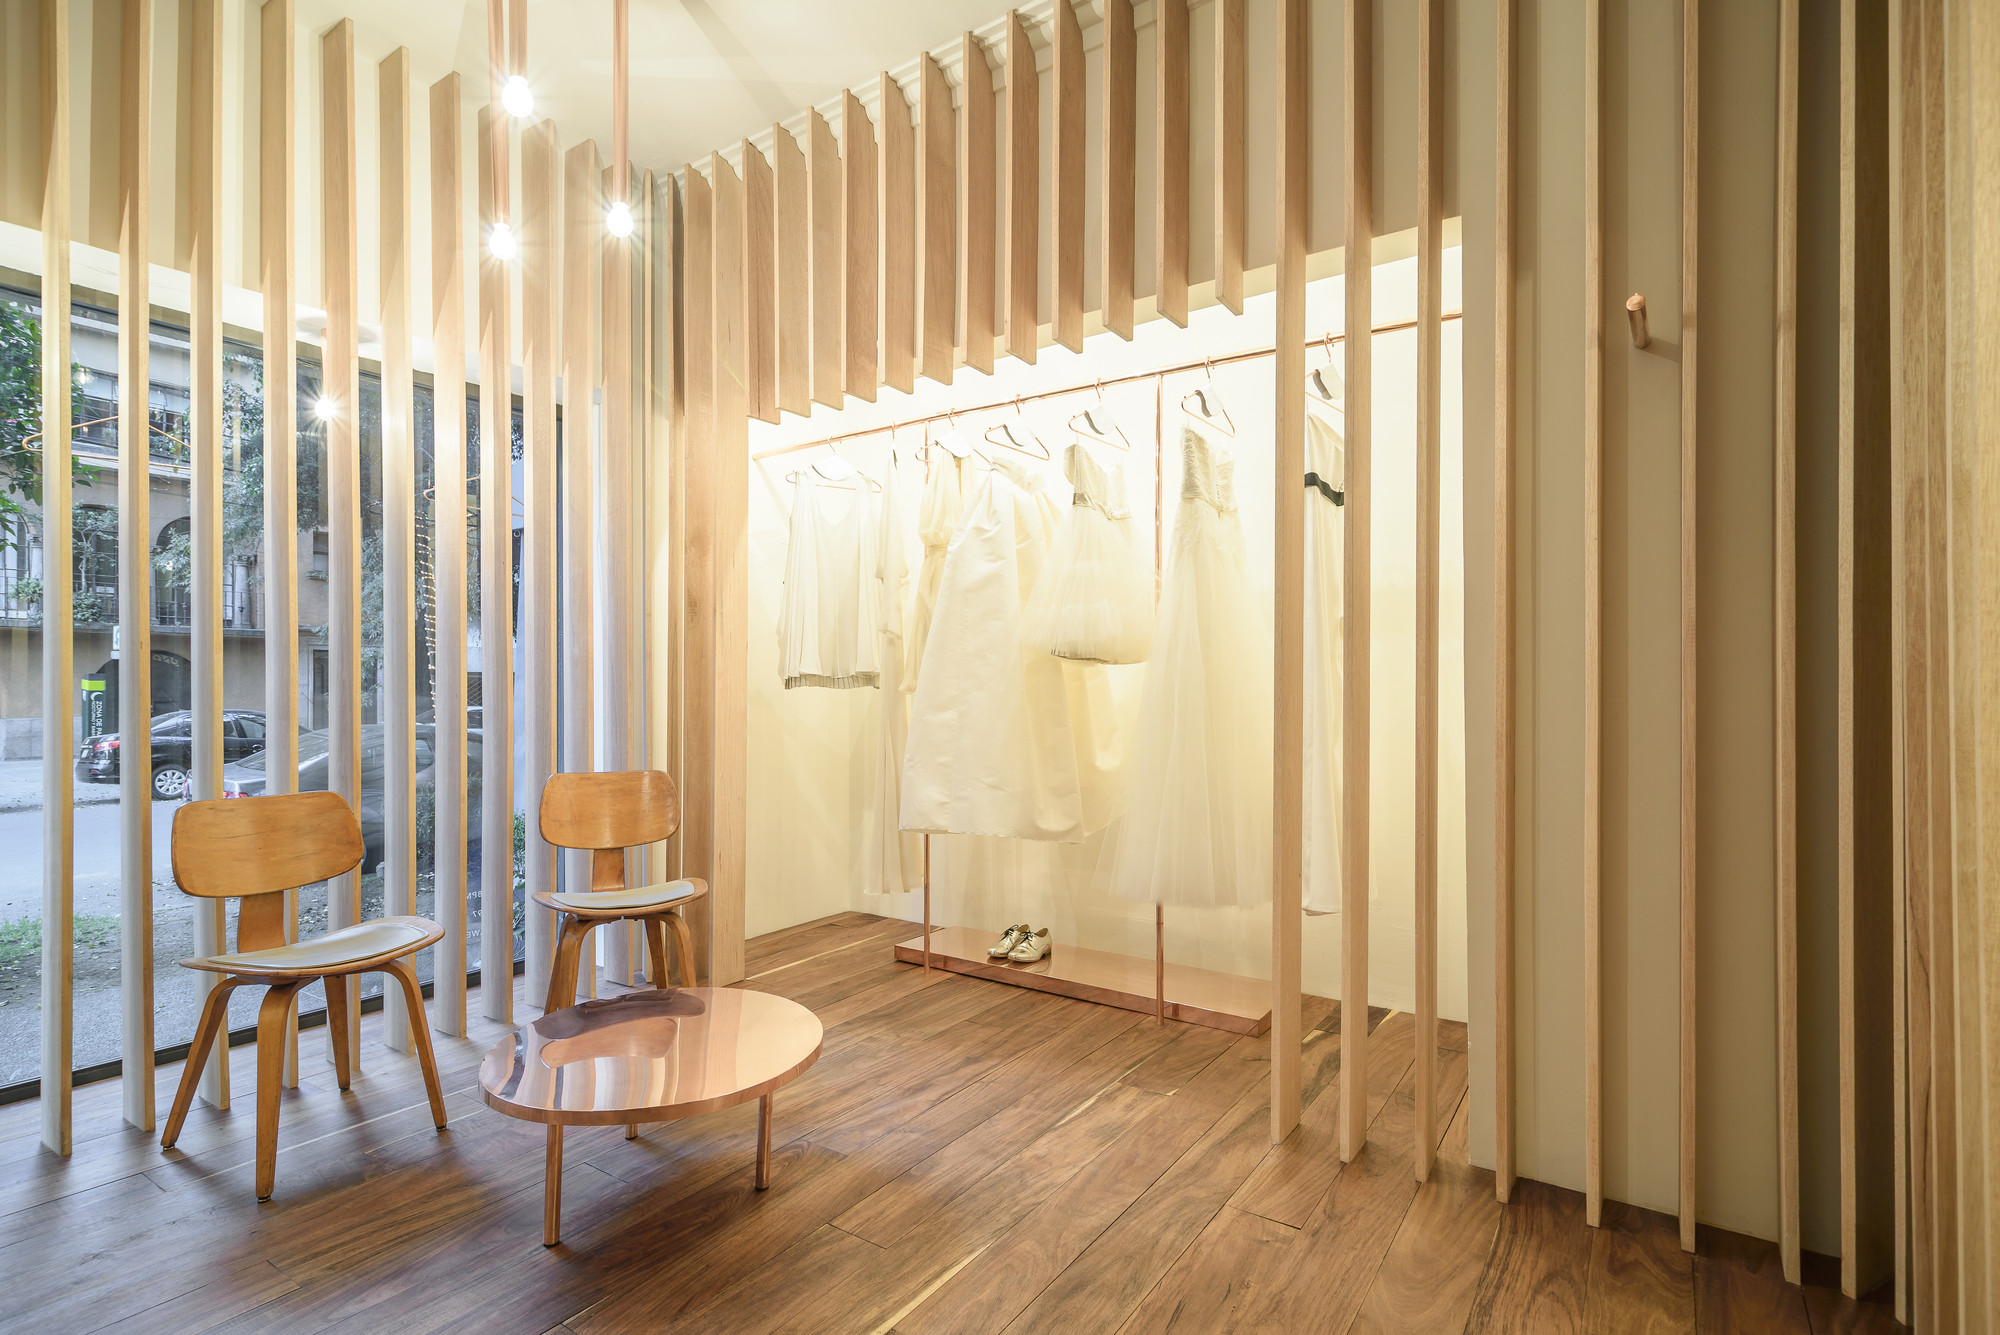 Boutique Sandra Weil / Zeller & Moye , © Moritz Bernoully